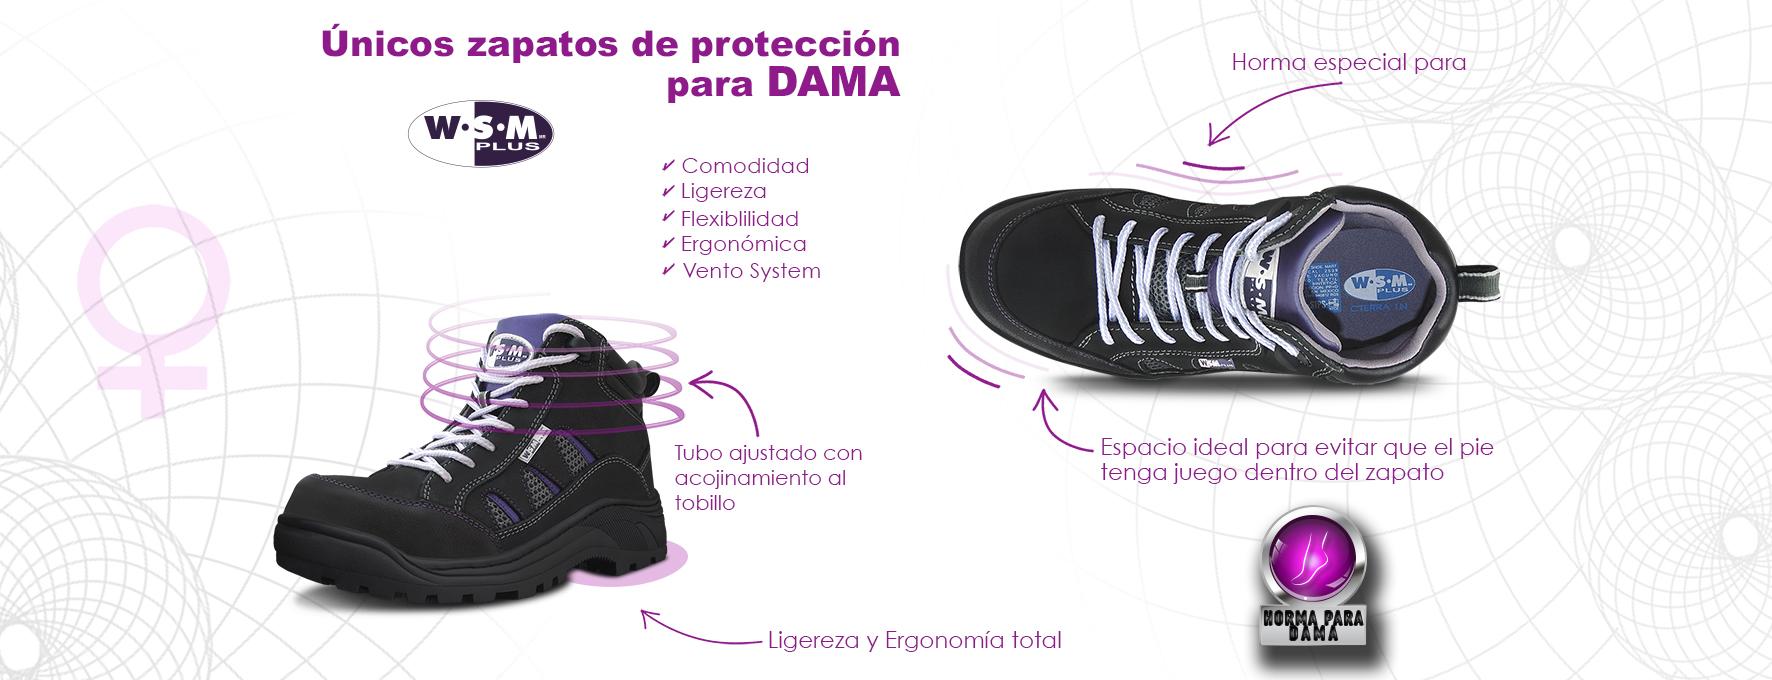 zapato de protección para dama2